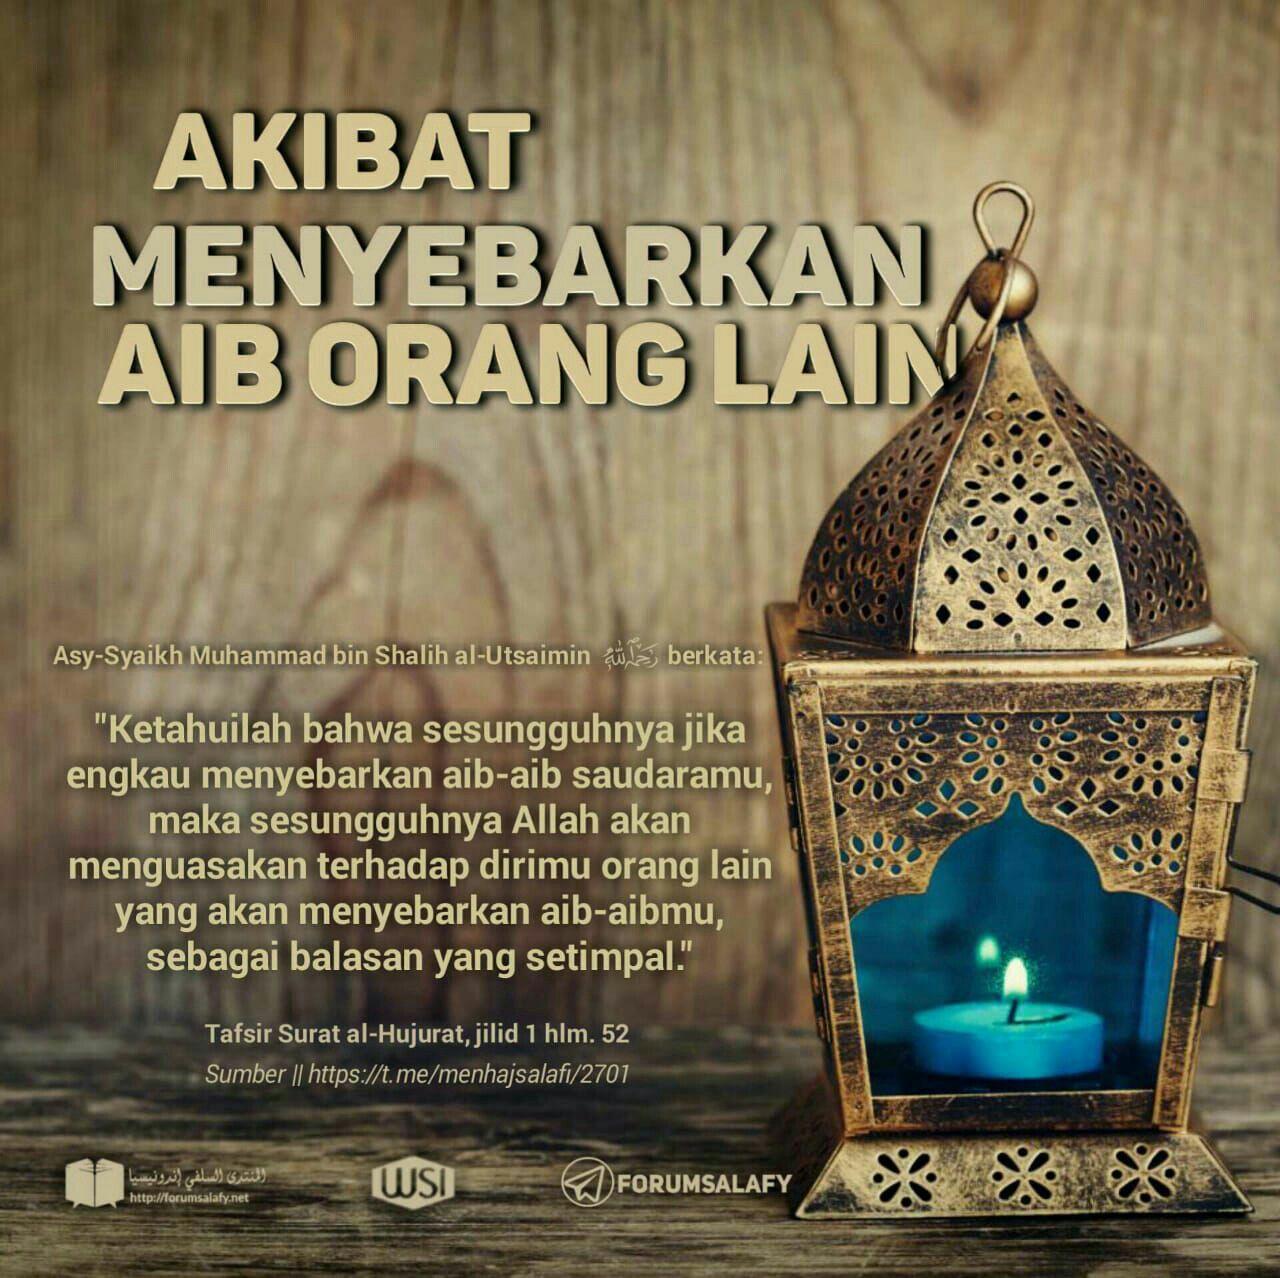 Akibat Menyebarkan Aib Orang Kutipan Agama Kekuatan Doa